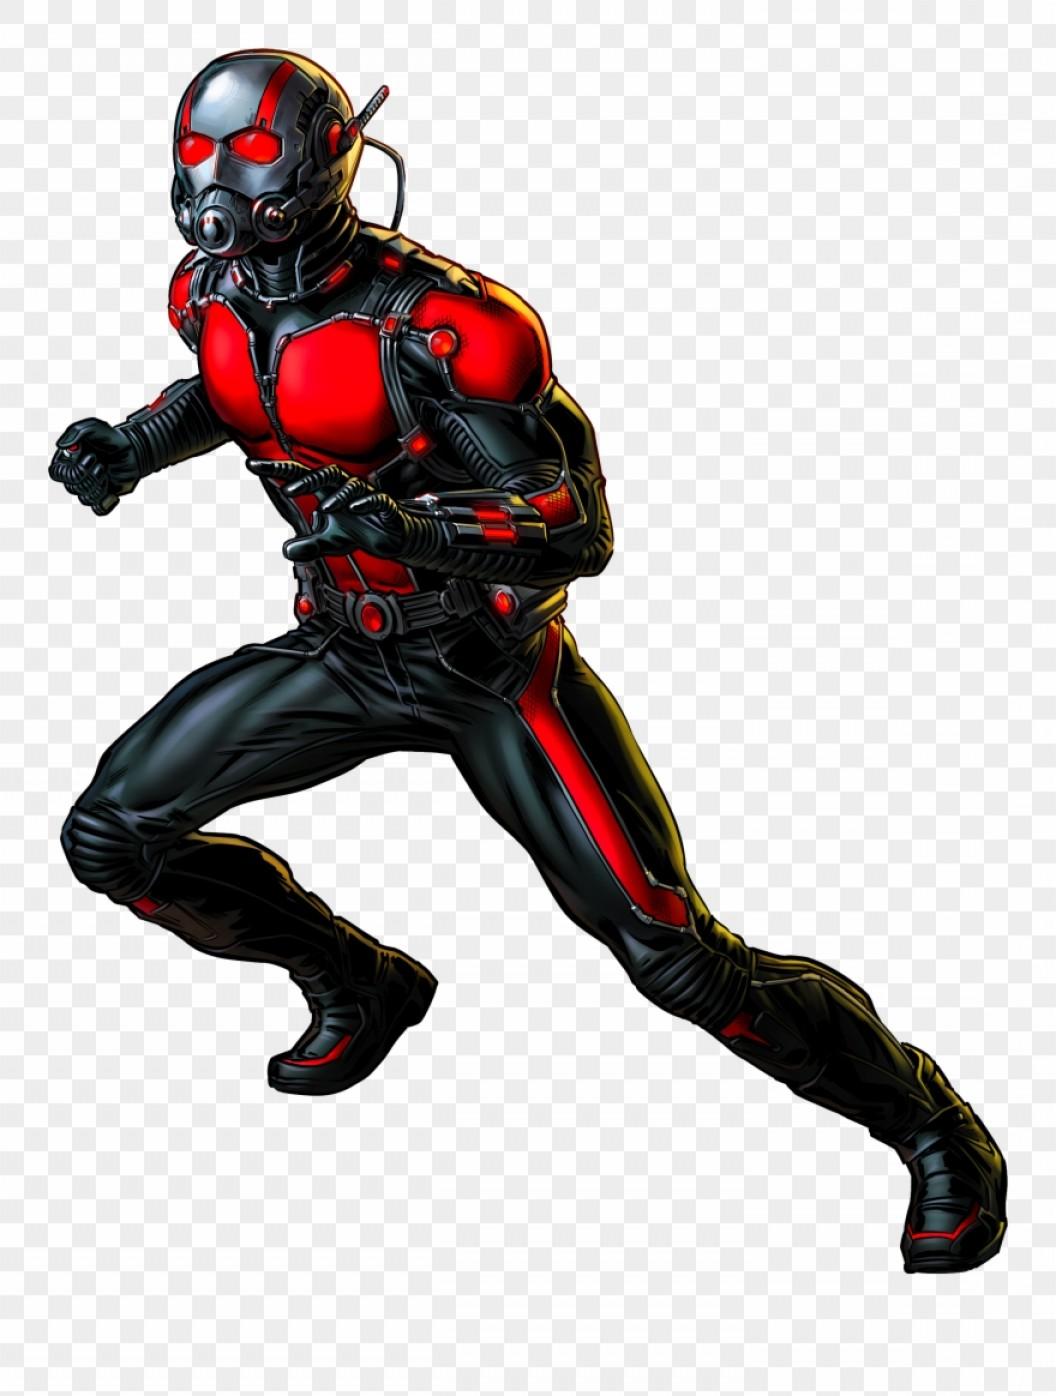 Wrhtmant Man Clip Art Ant Man Marvel Clipart.